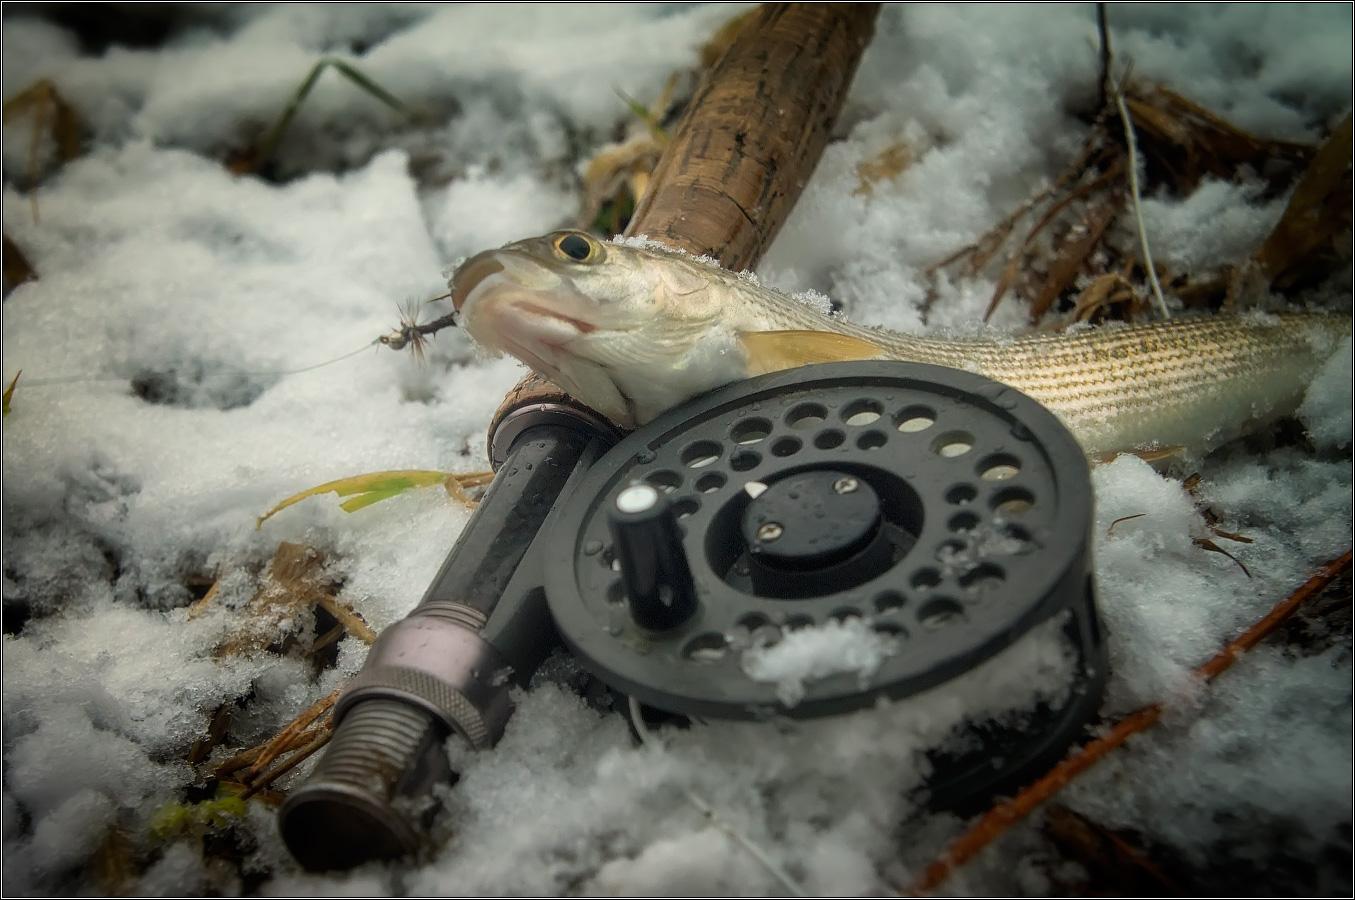 http://i3.imageban.ru/out/2012/11/25/cc92b40196075b2a3f1a61e14f3afb5a.jpg